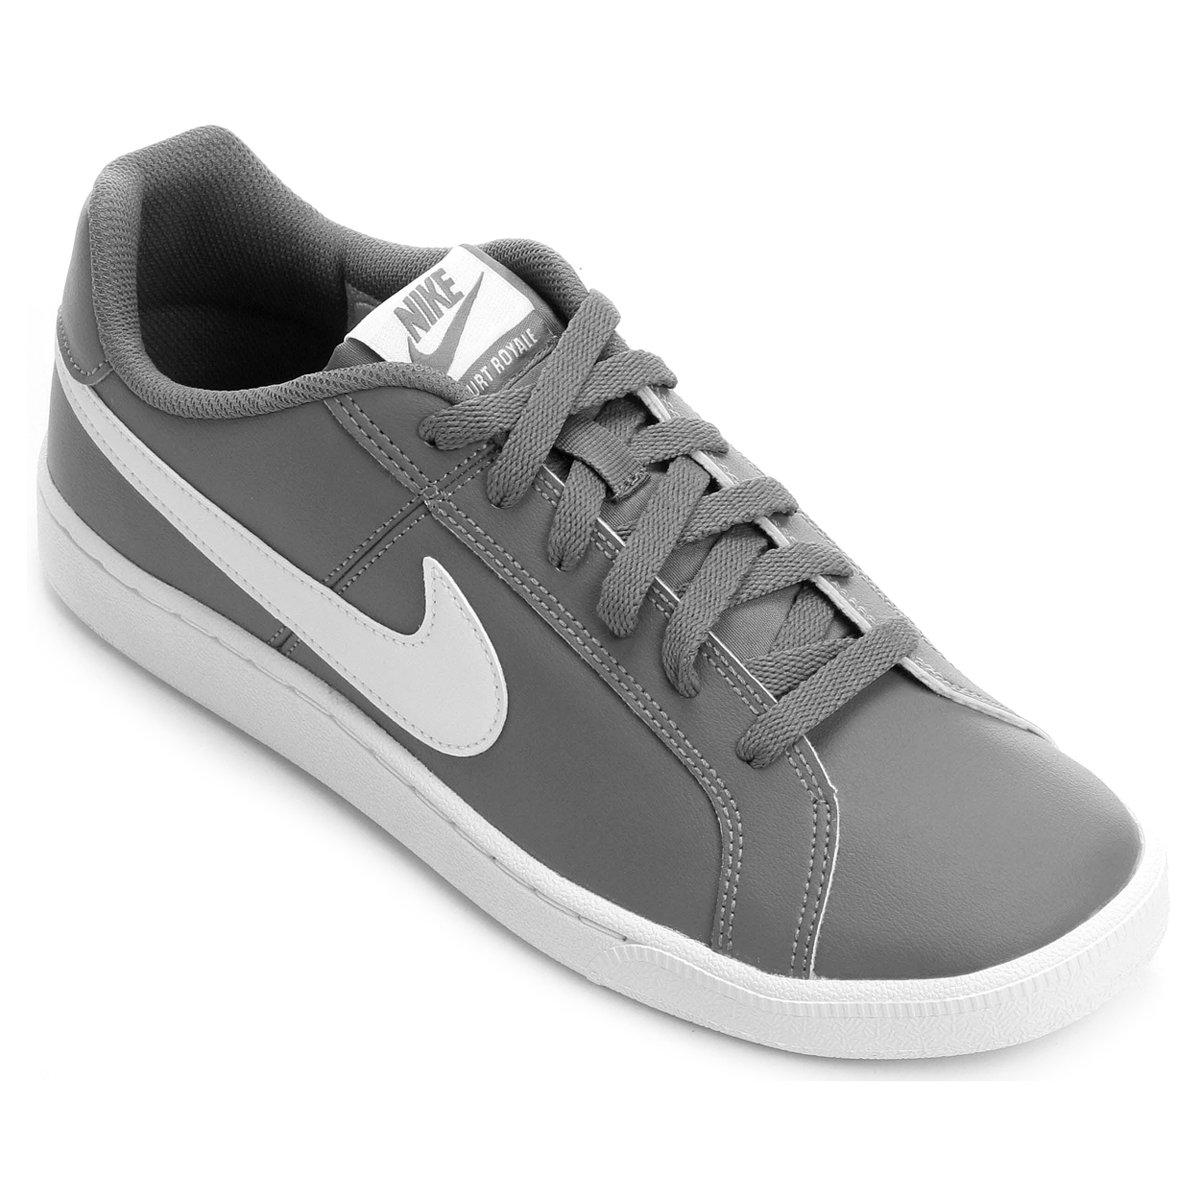 Tênis Couro Nike Court Royale Masculino - Cinza e Branco - Compre Agora  35180df98a702